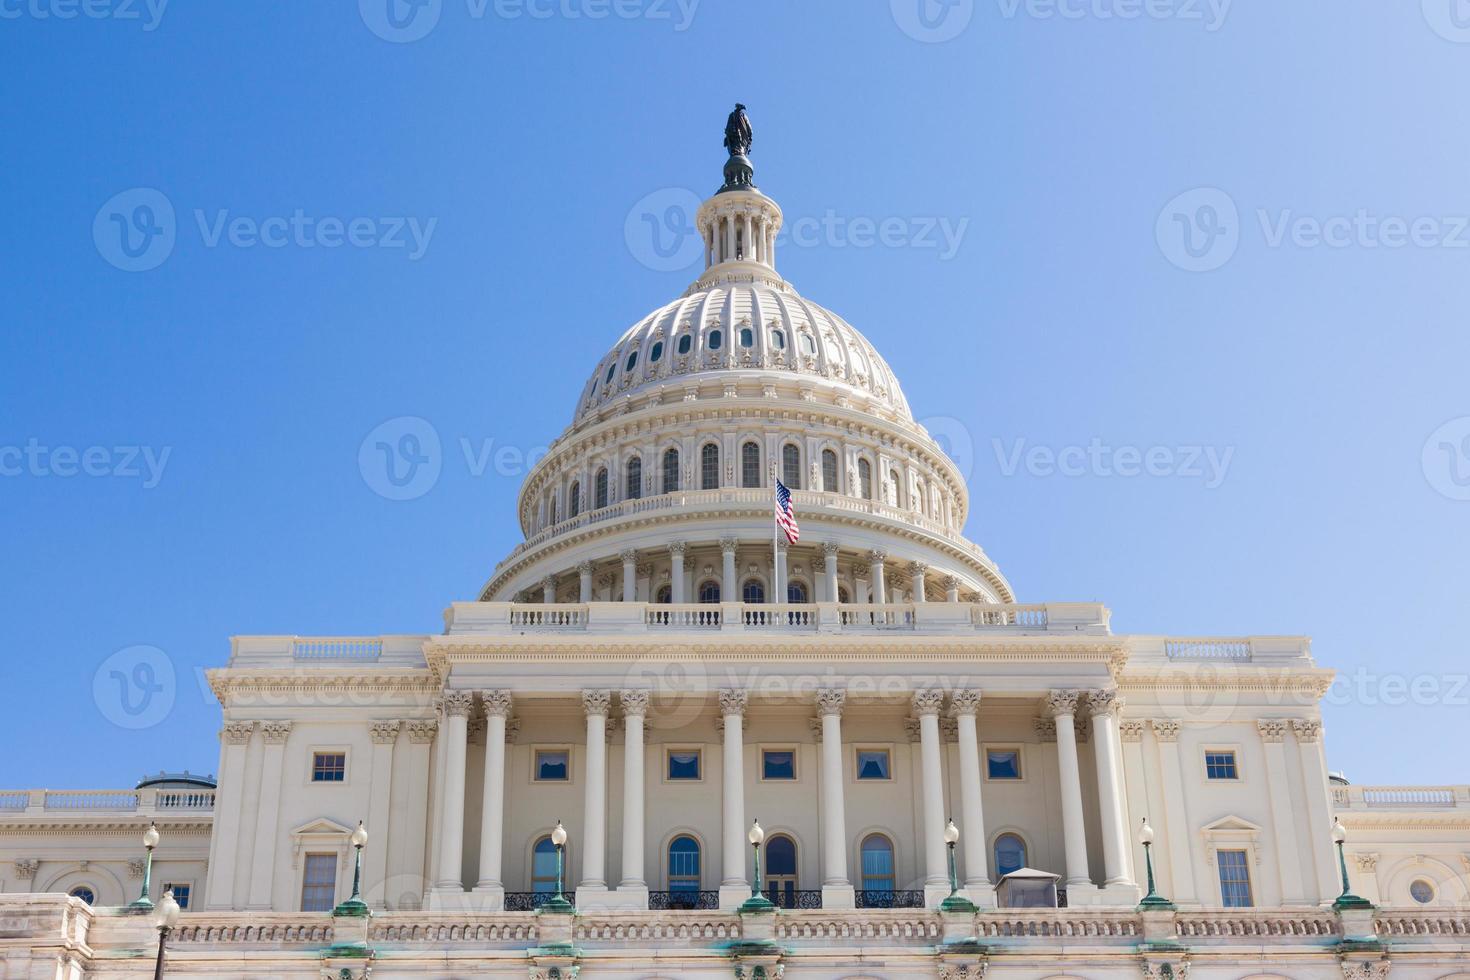 uns Kapitol Gebäude in Washington DC foto